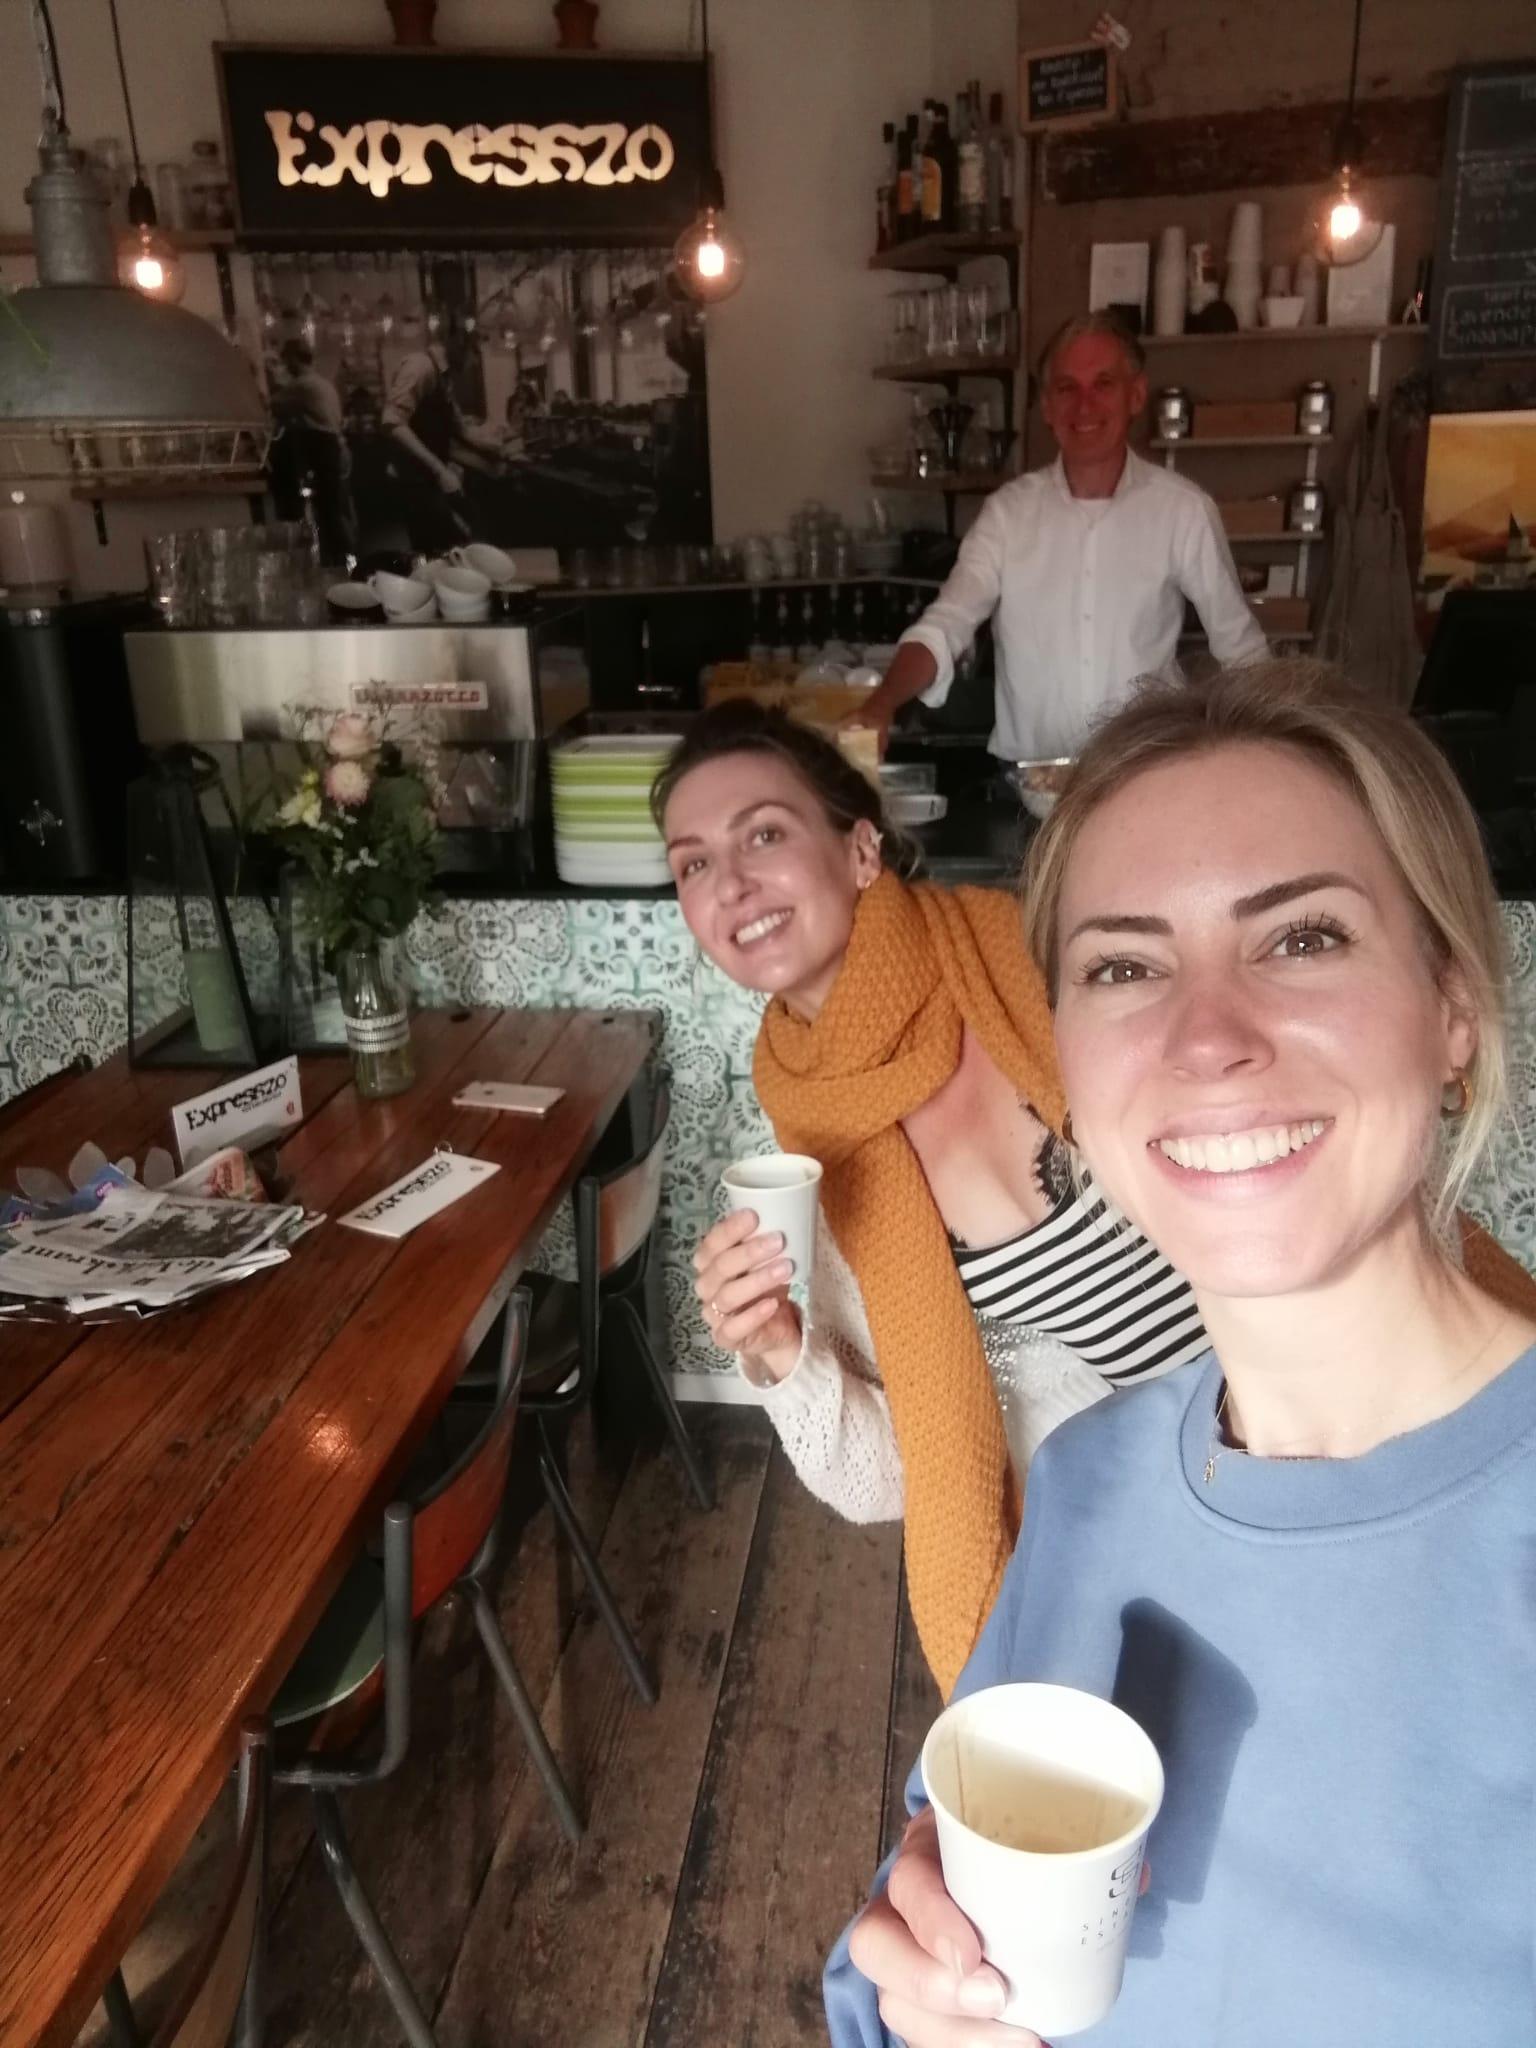 expresso, coffee bar, middelburg, zeeland, hotspot